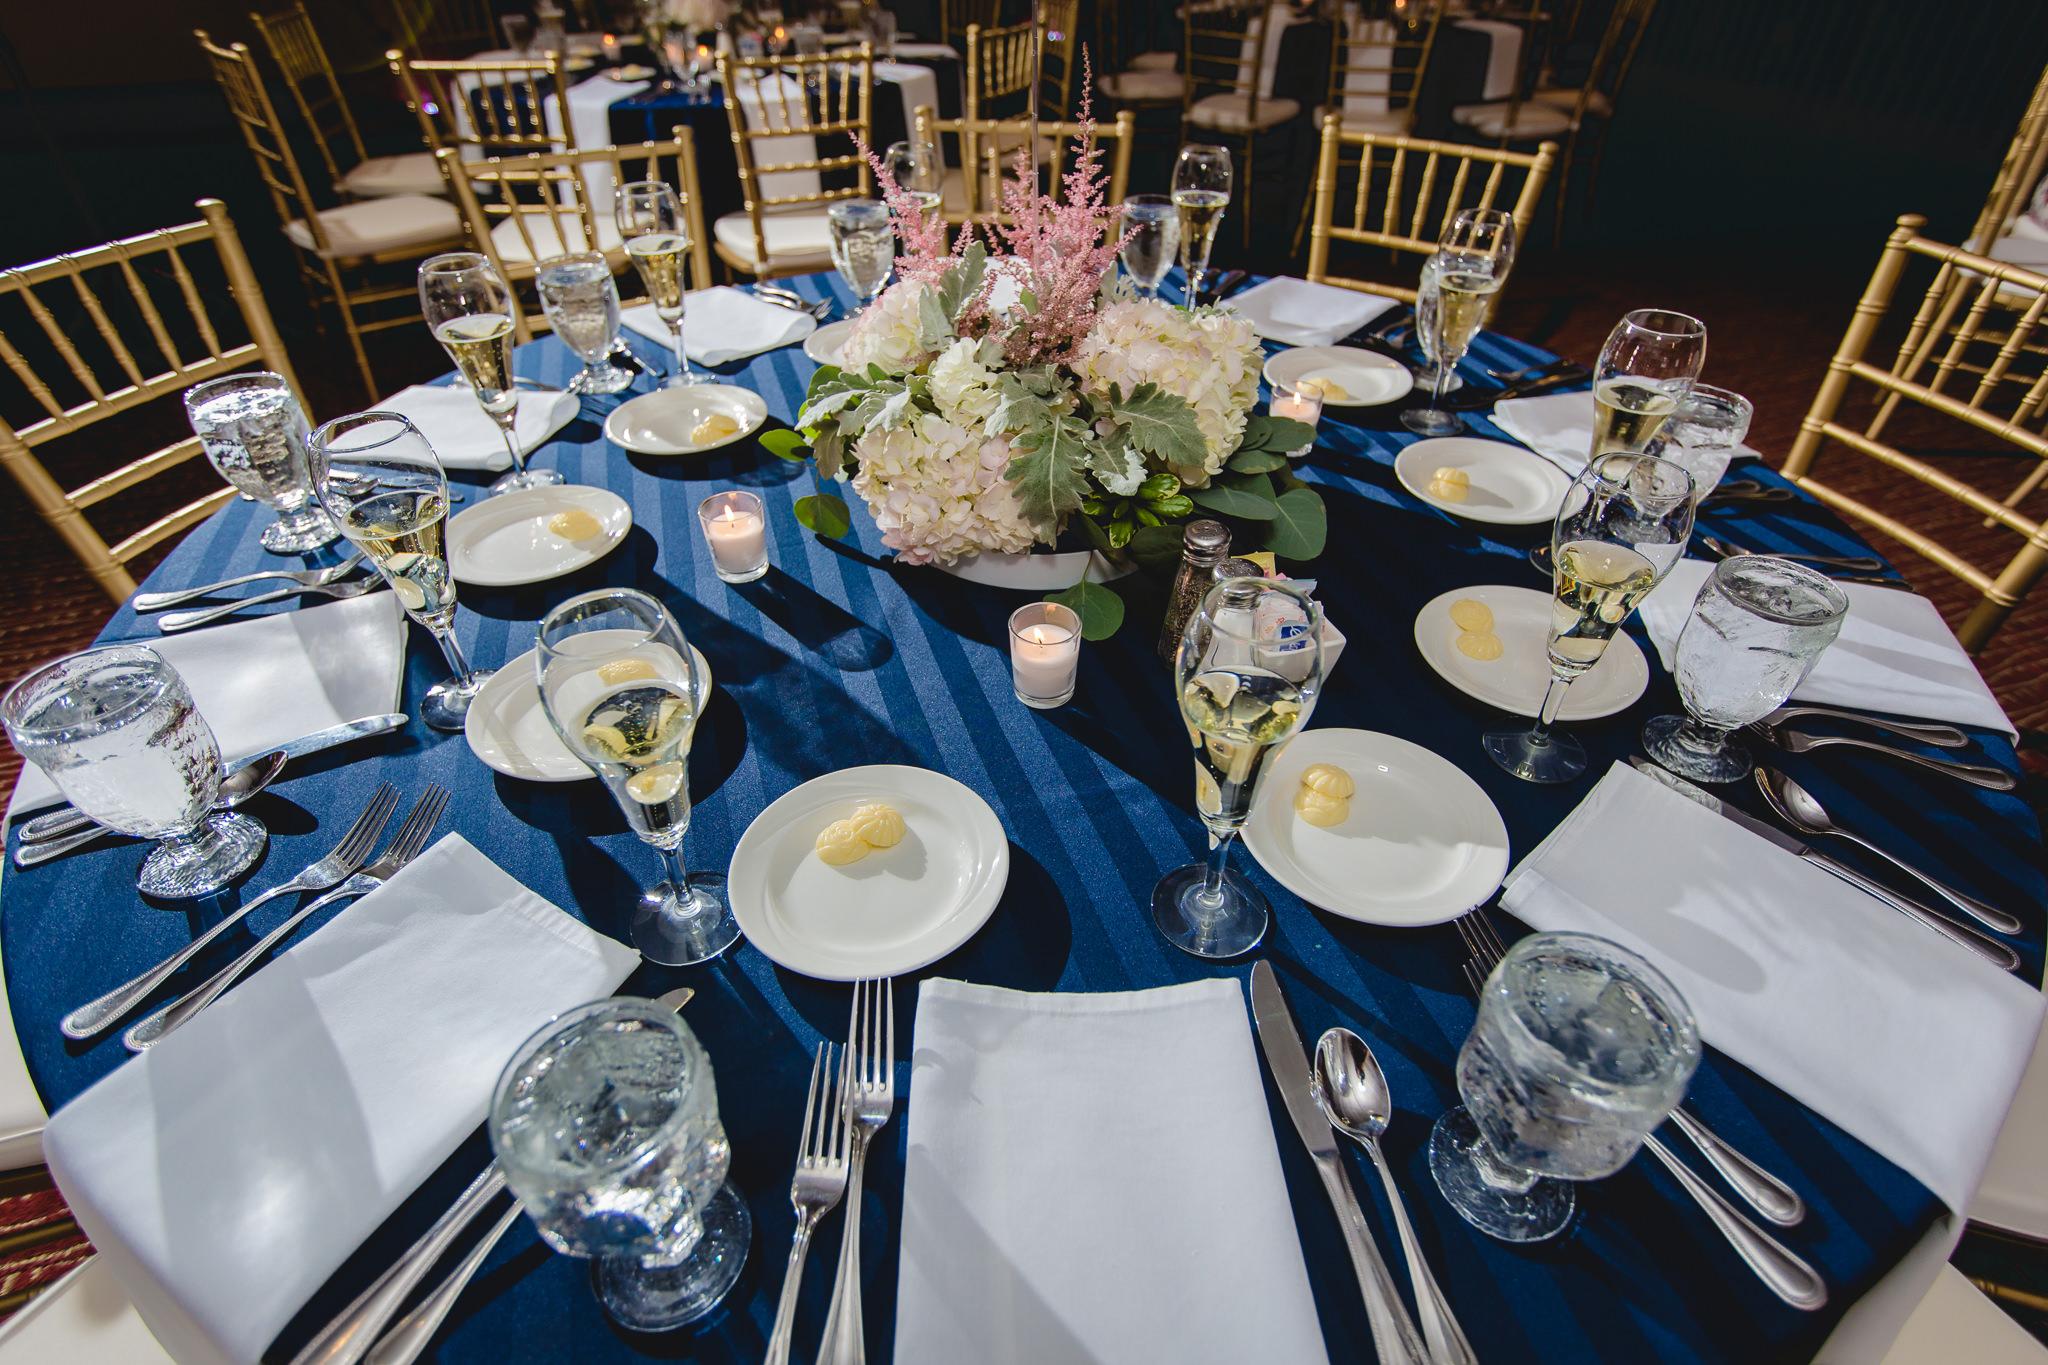 Table settings at a Hidden Valley Resort wedding reception